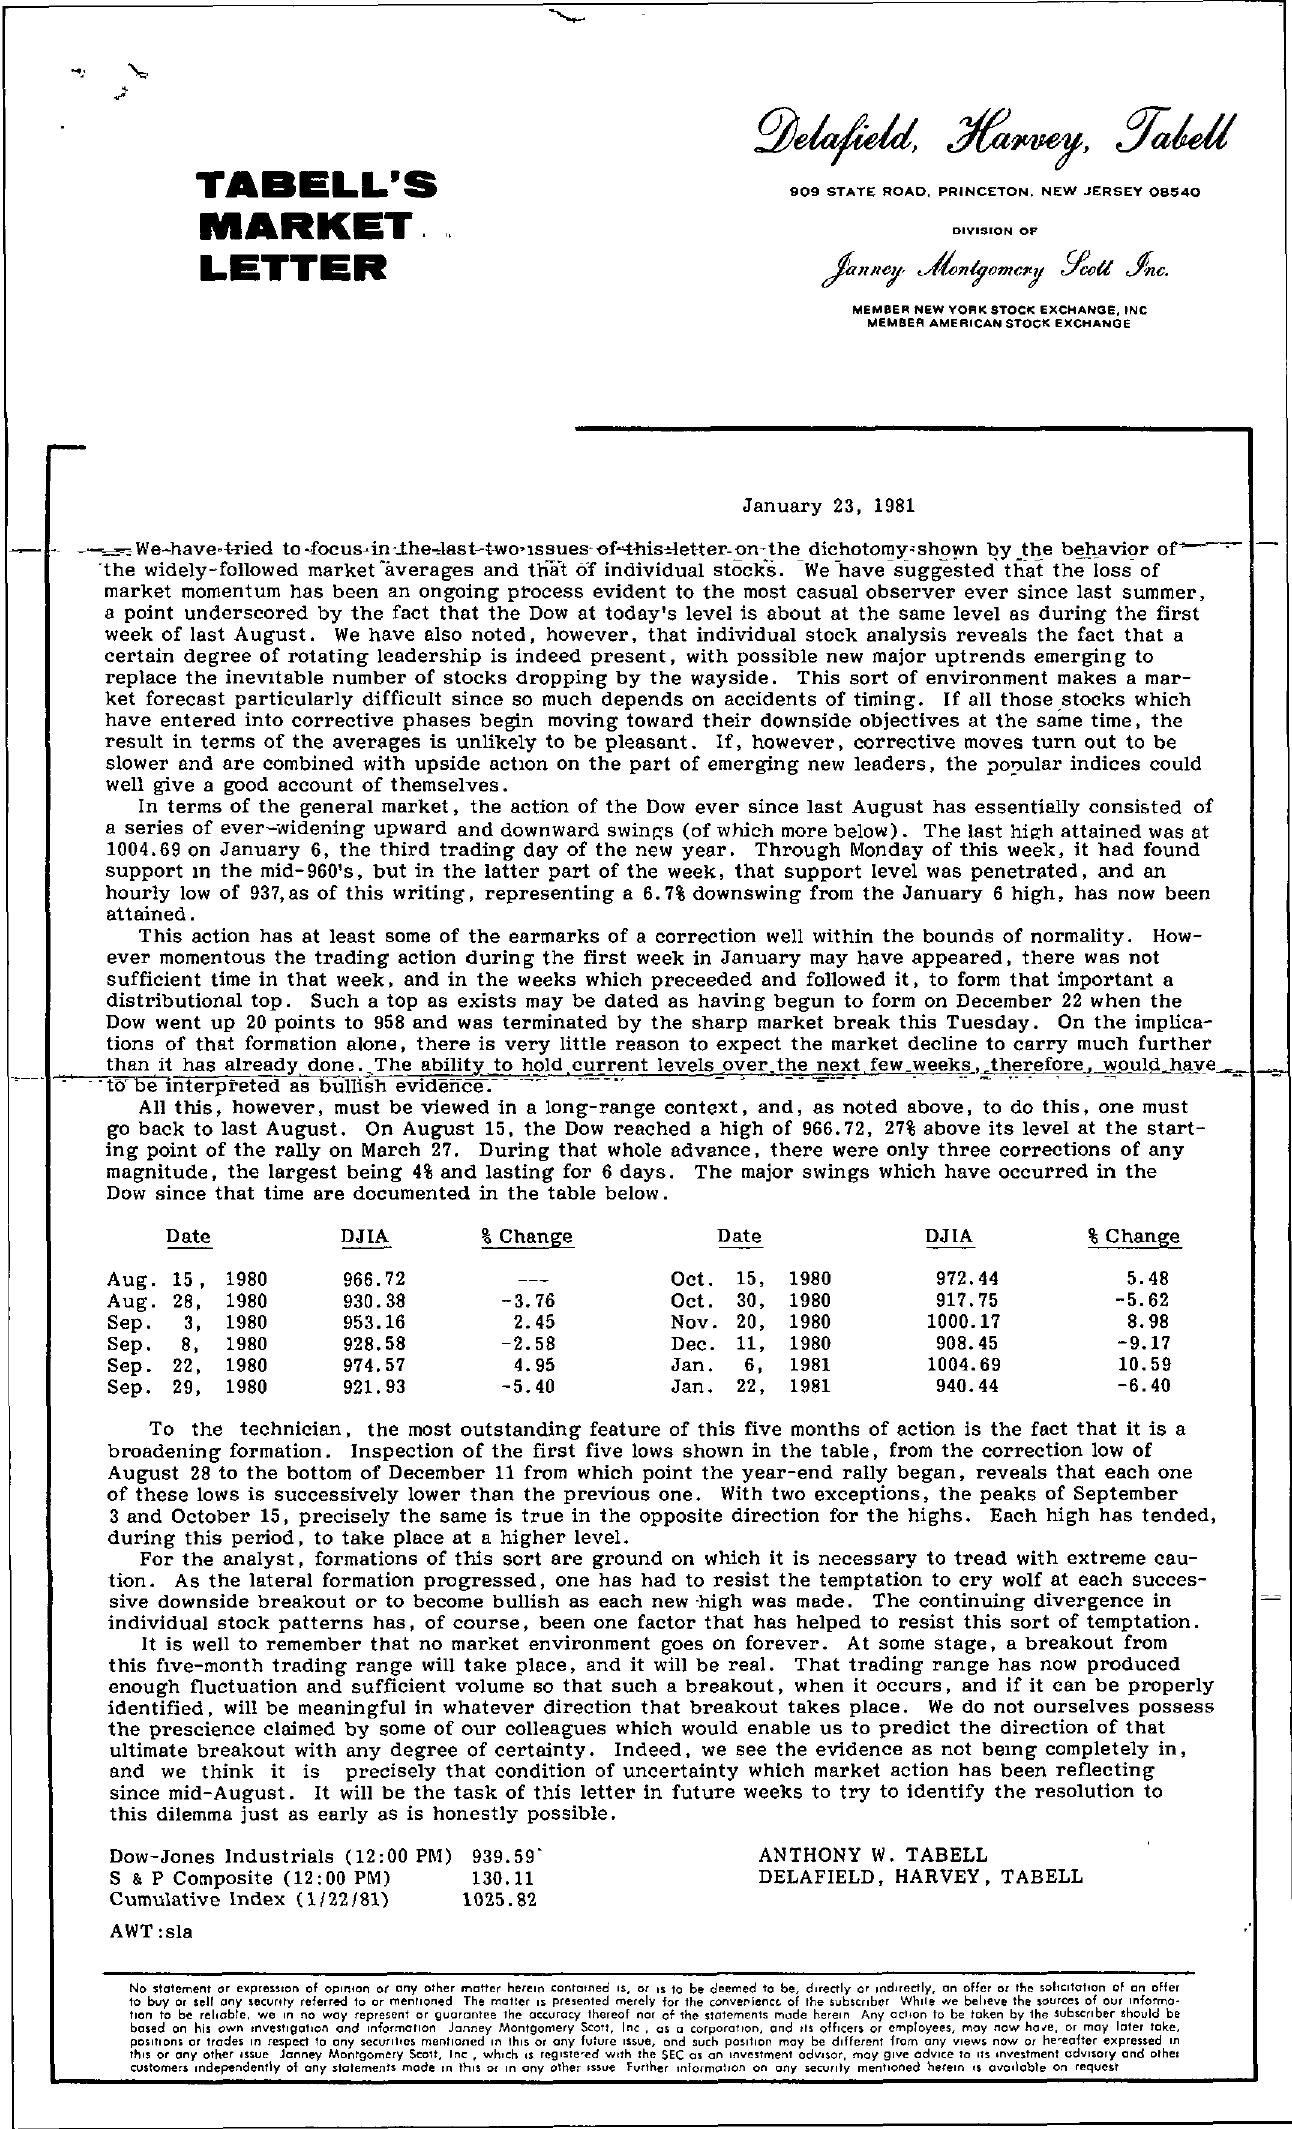 Tabell's Market Letter - January 23, 1981